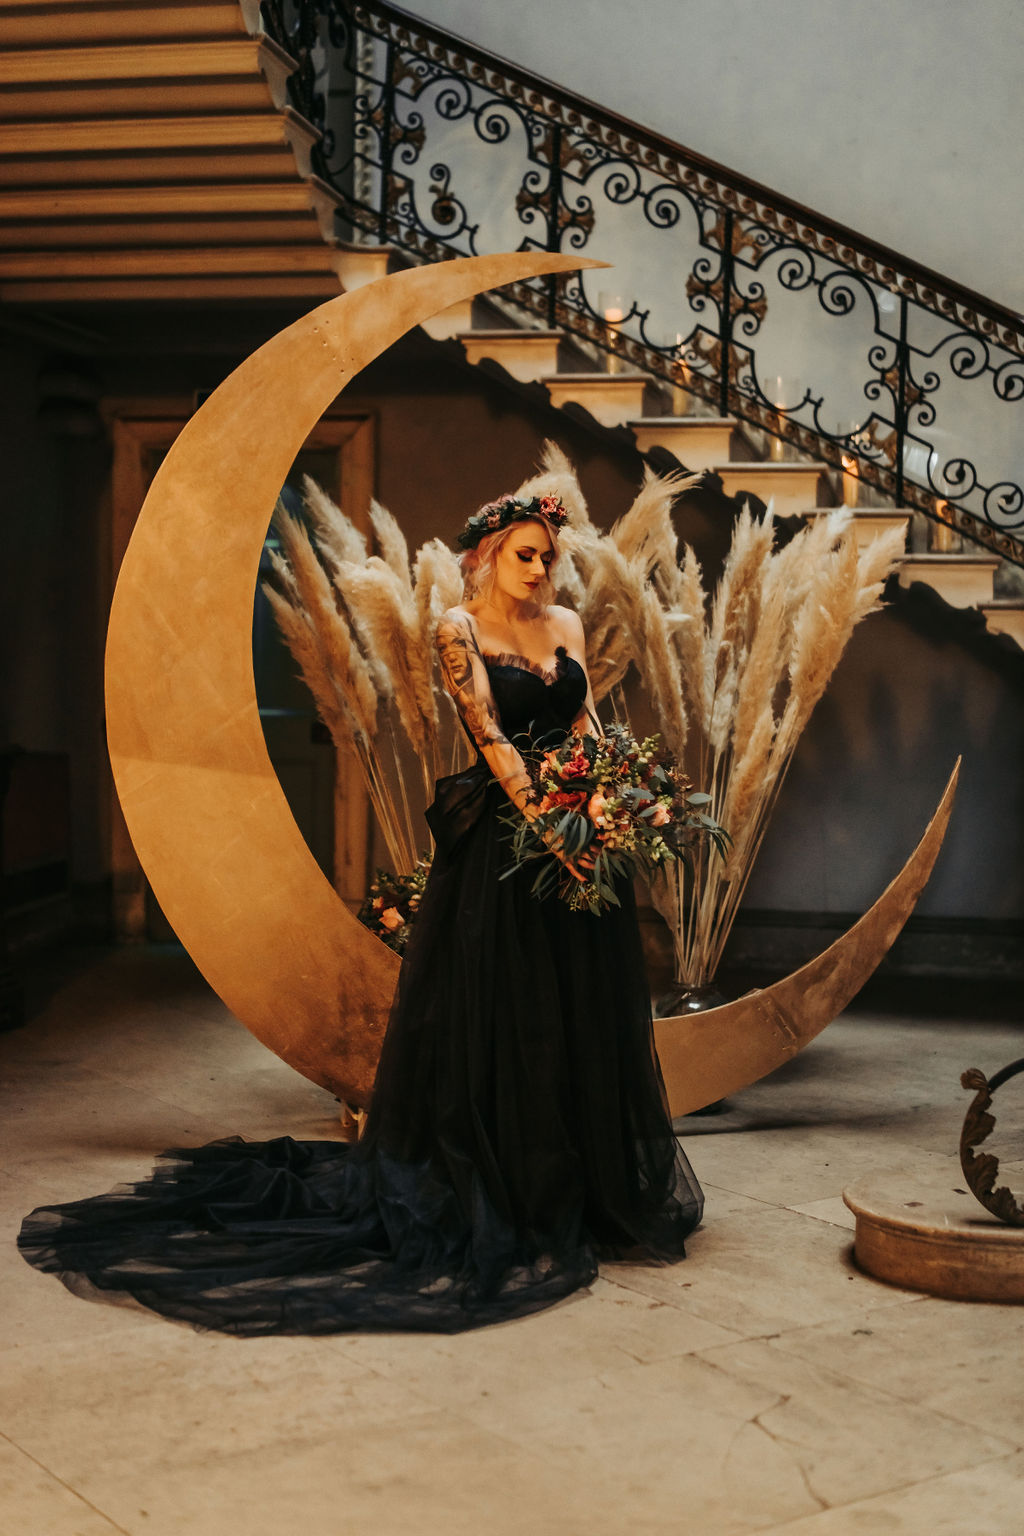 celestial gothic wedding - moon wedding prop - black wedding dress - wedding pampas grass - alternative wedding inspiration